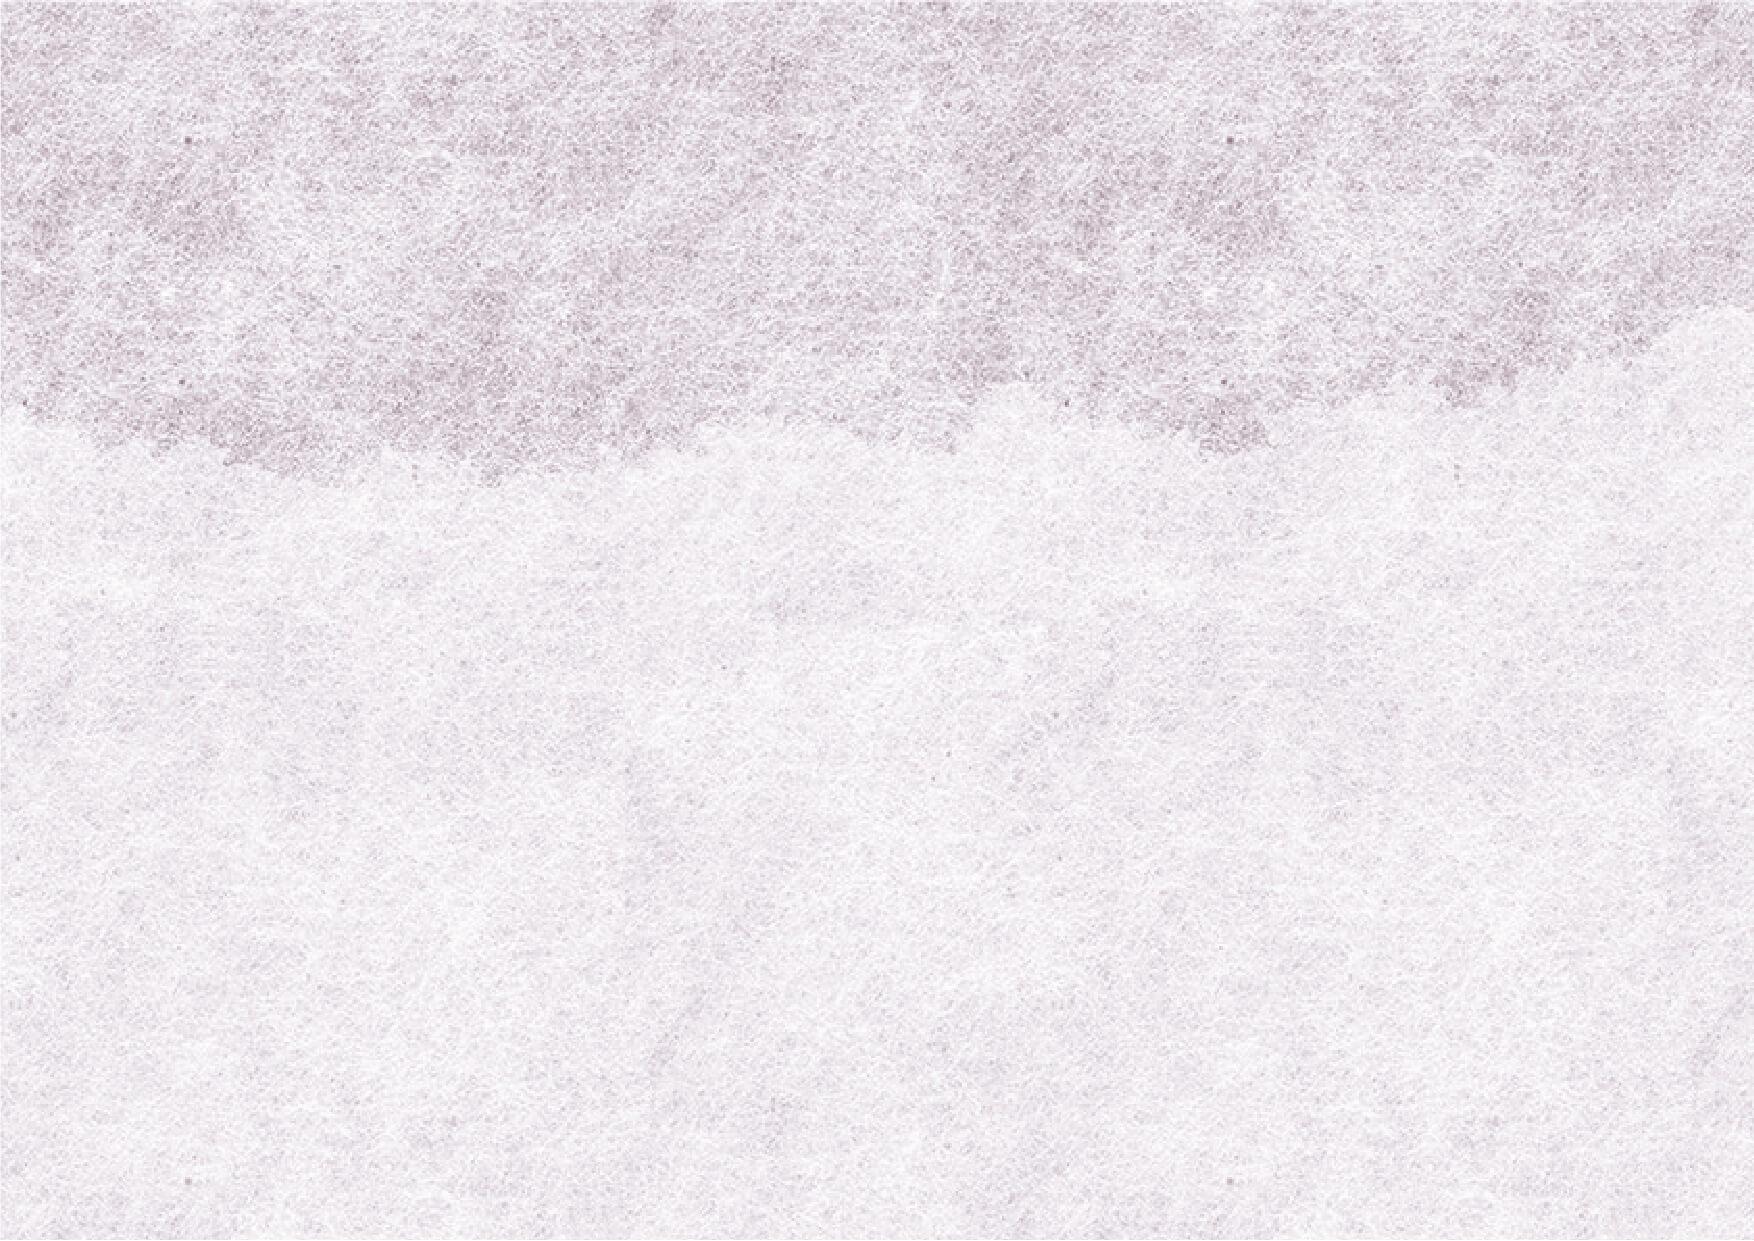 gray image